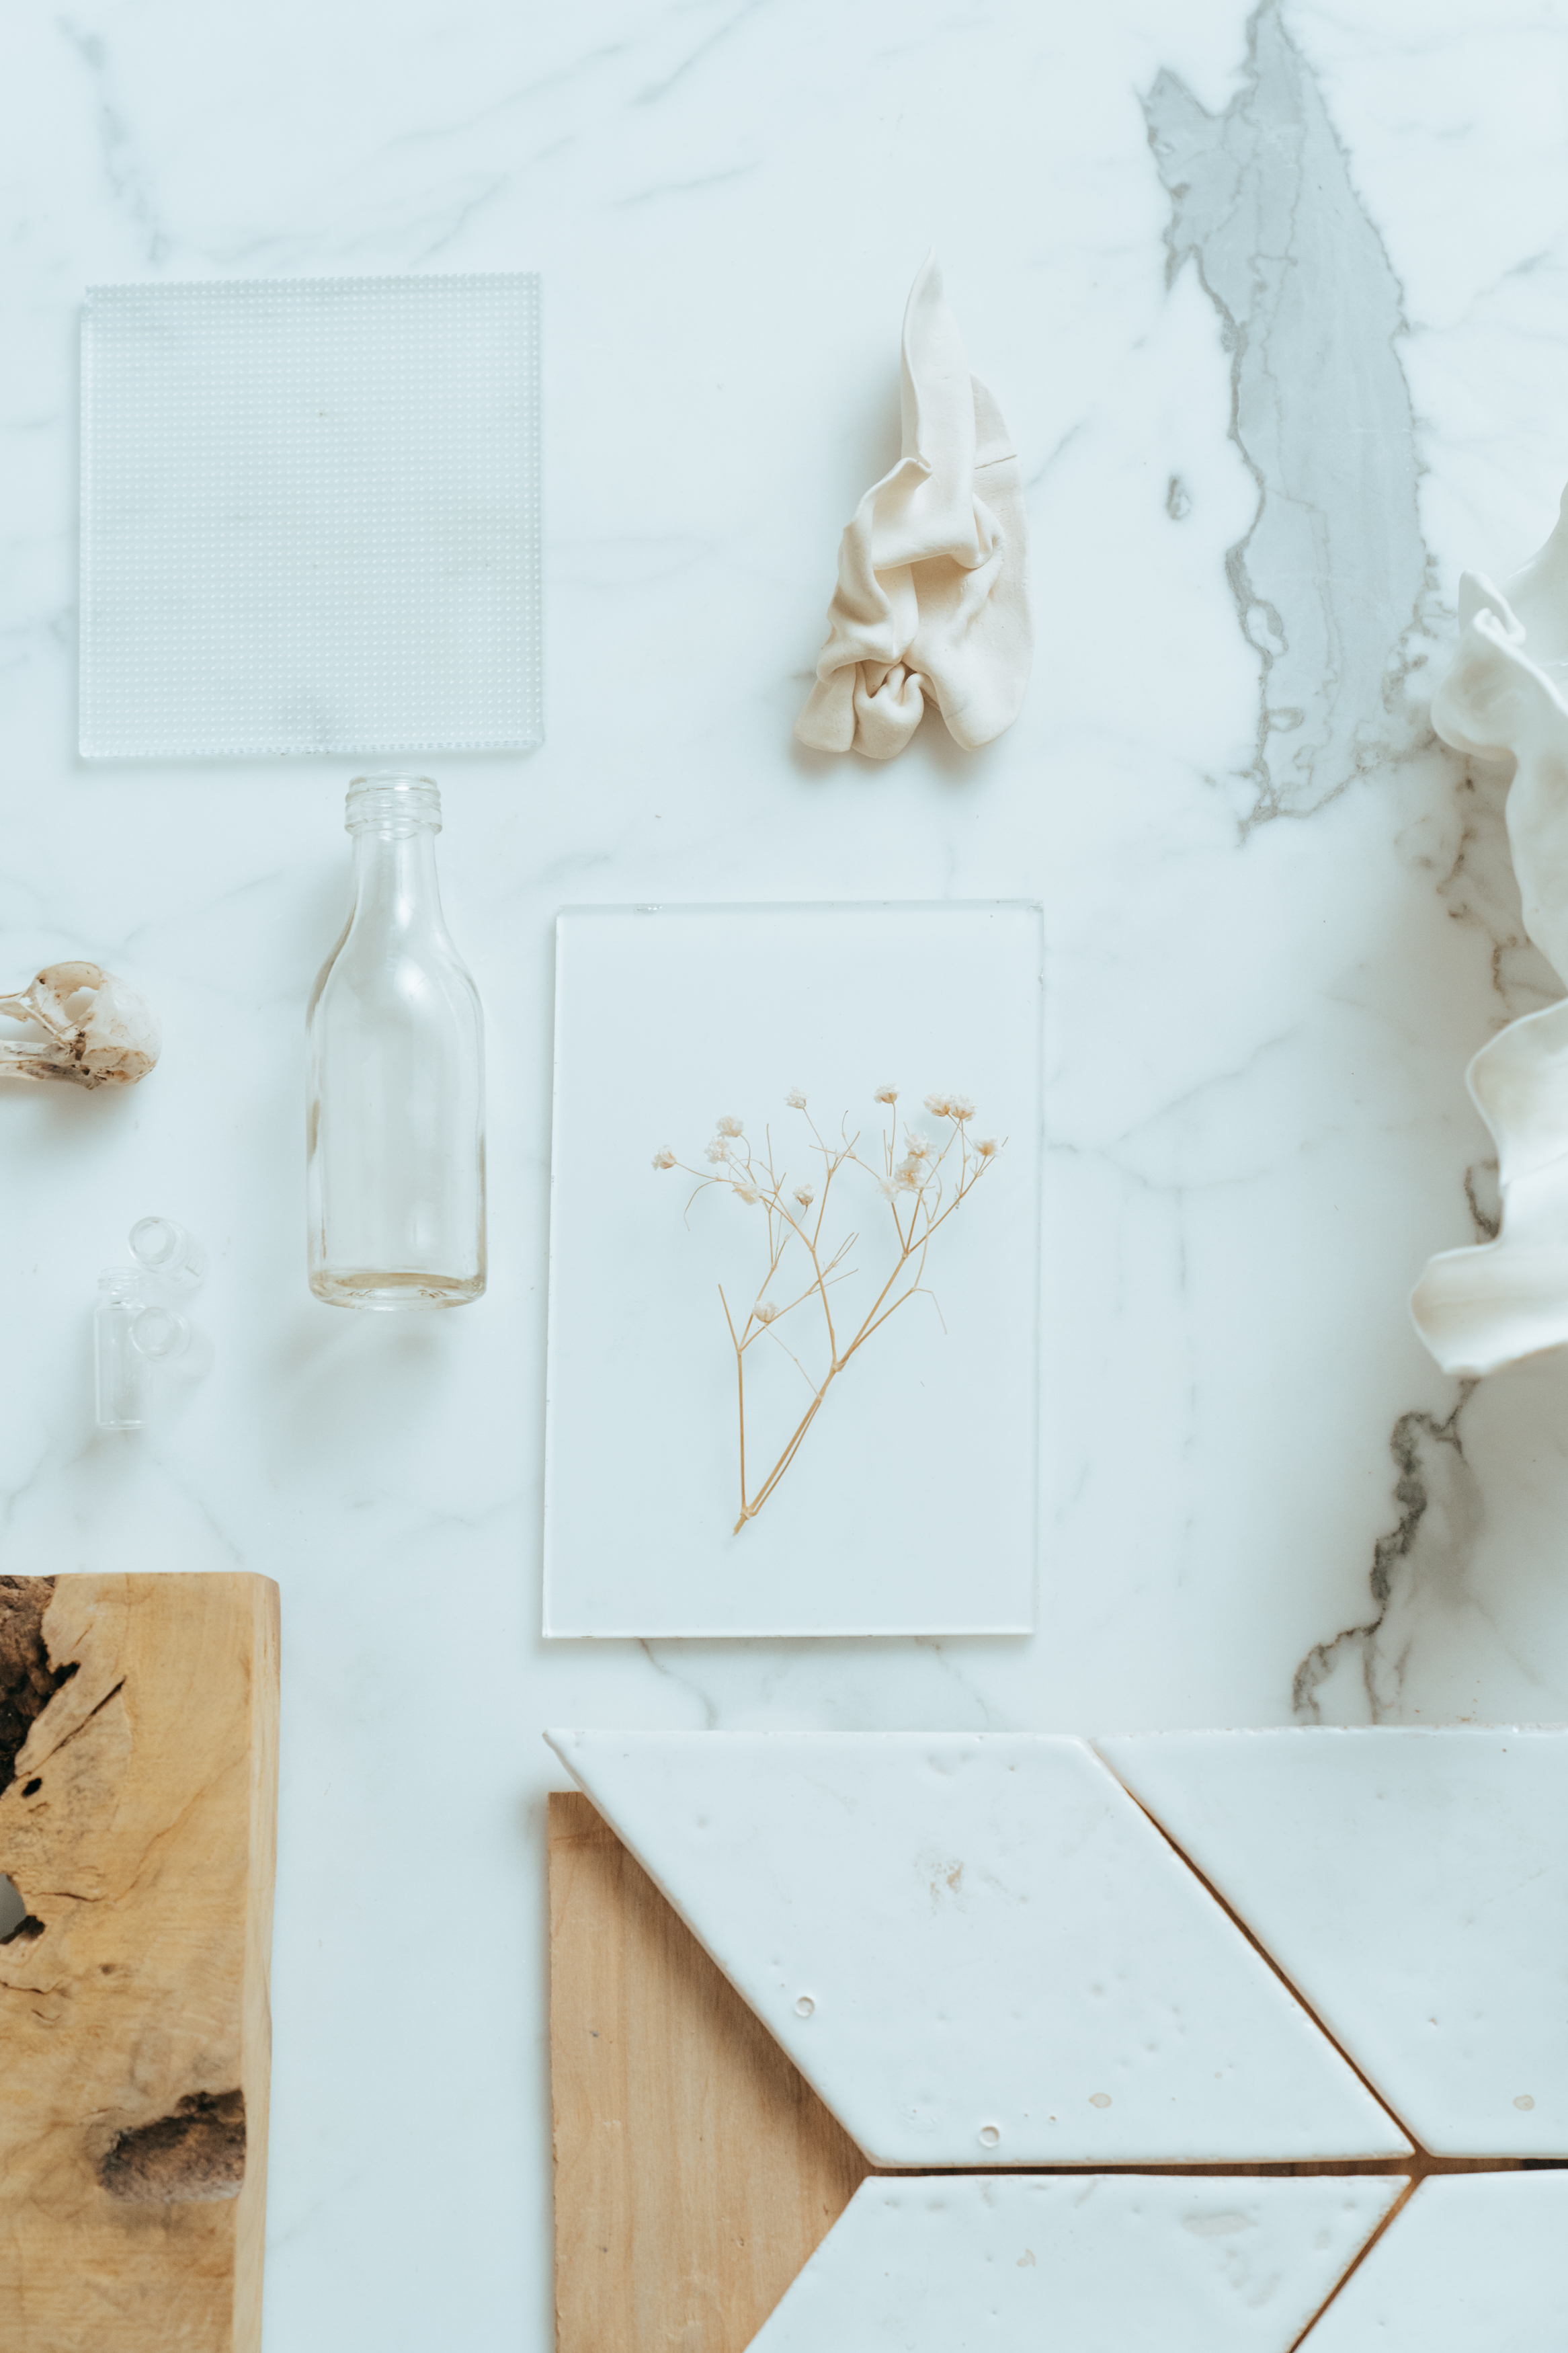 white ceramic angel figurine on white wooden table